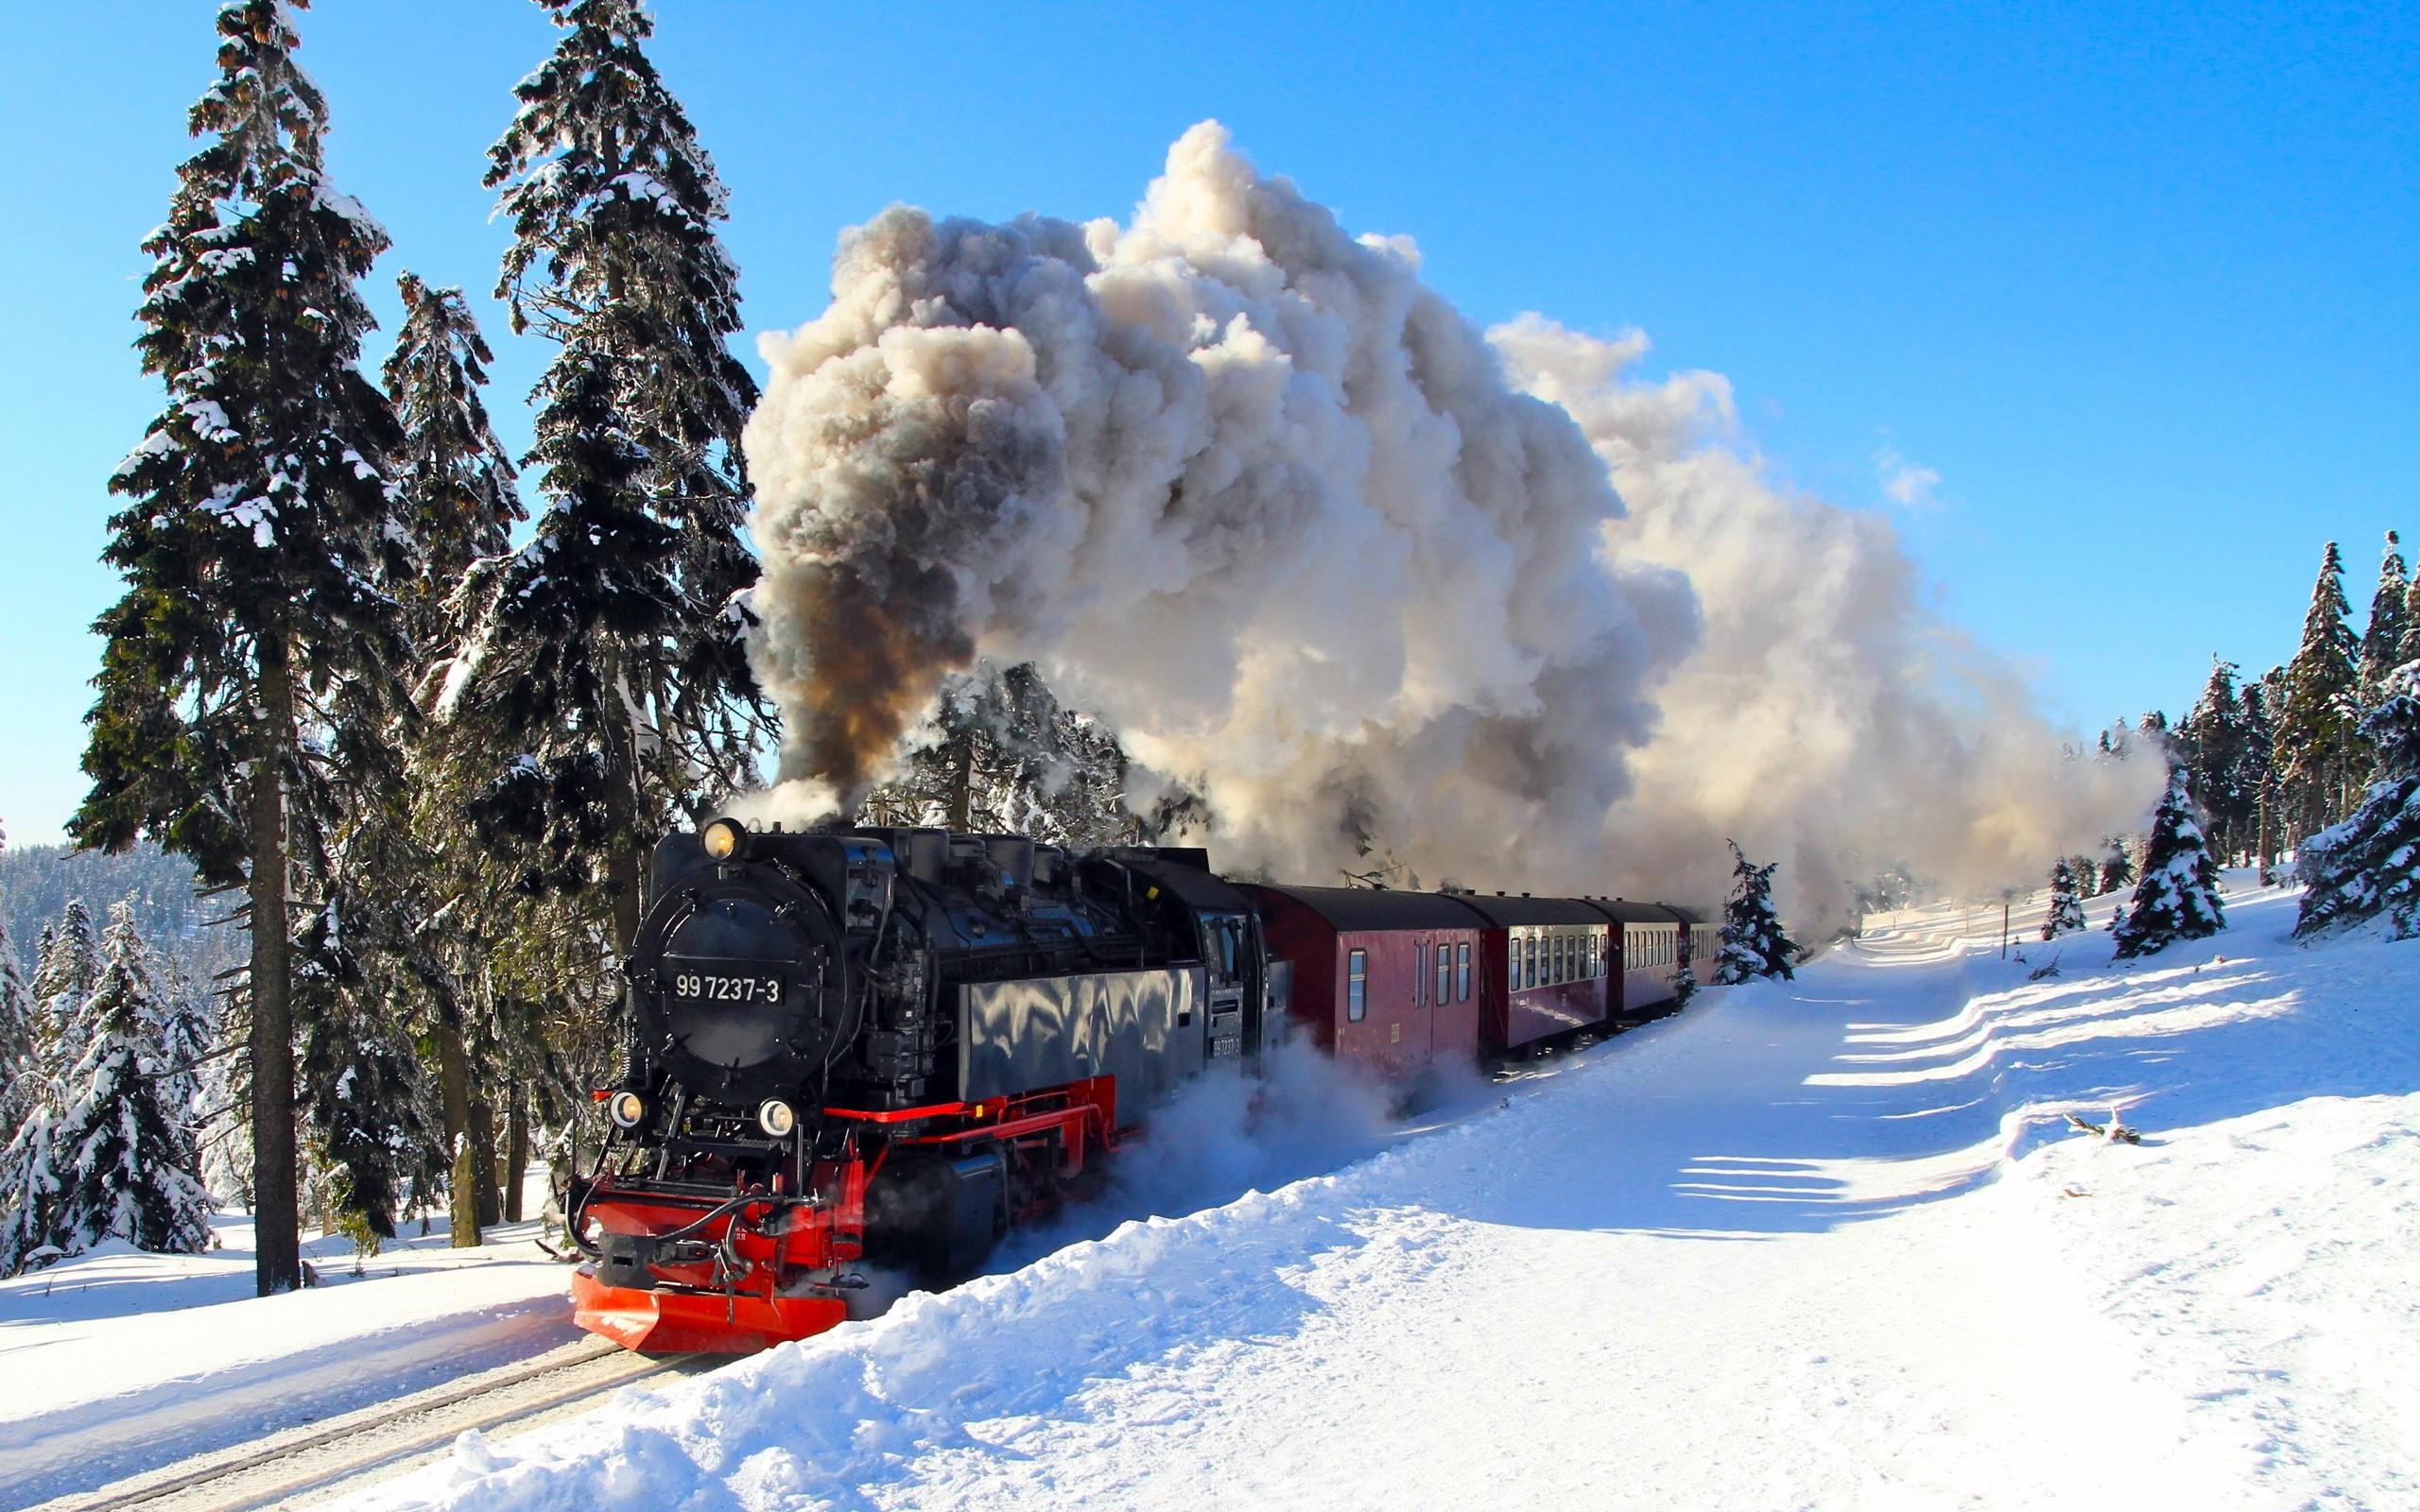 Free Download Fond Ecran Train Hd Paysage Hiver Neige